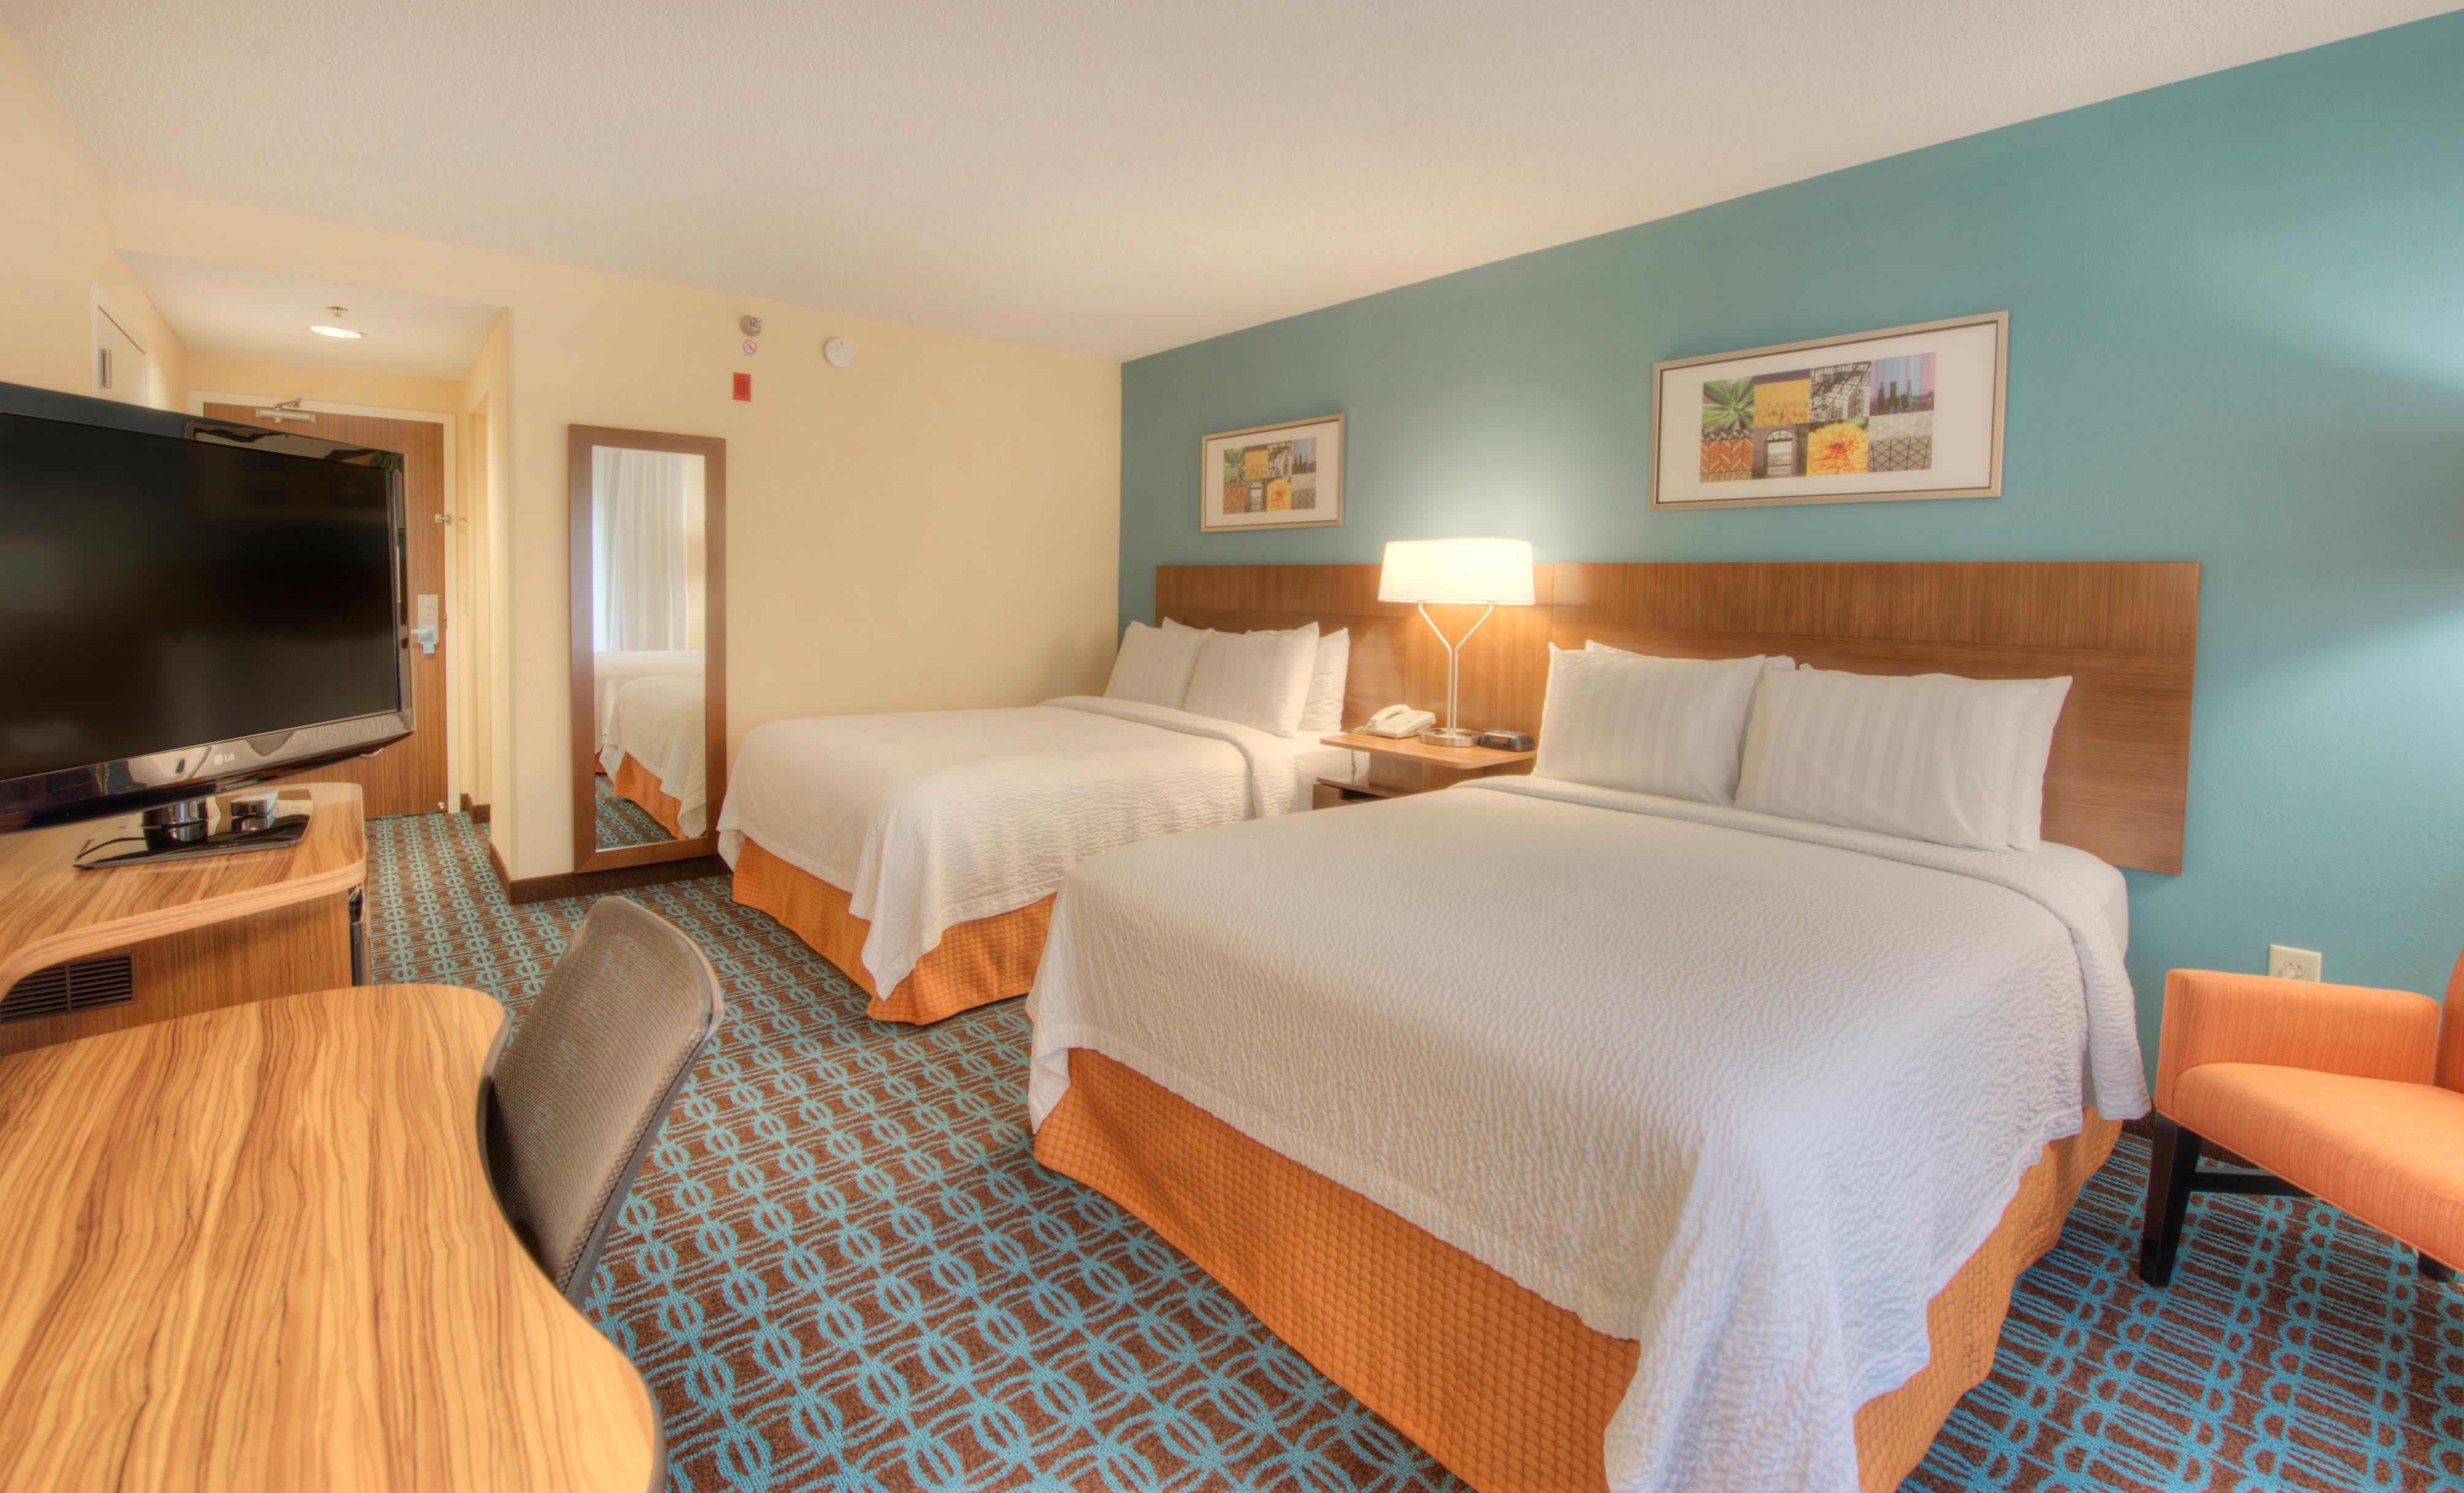 Fairfield Inn & Suites by Marriott Raleigh Crabtree Valley image 6